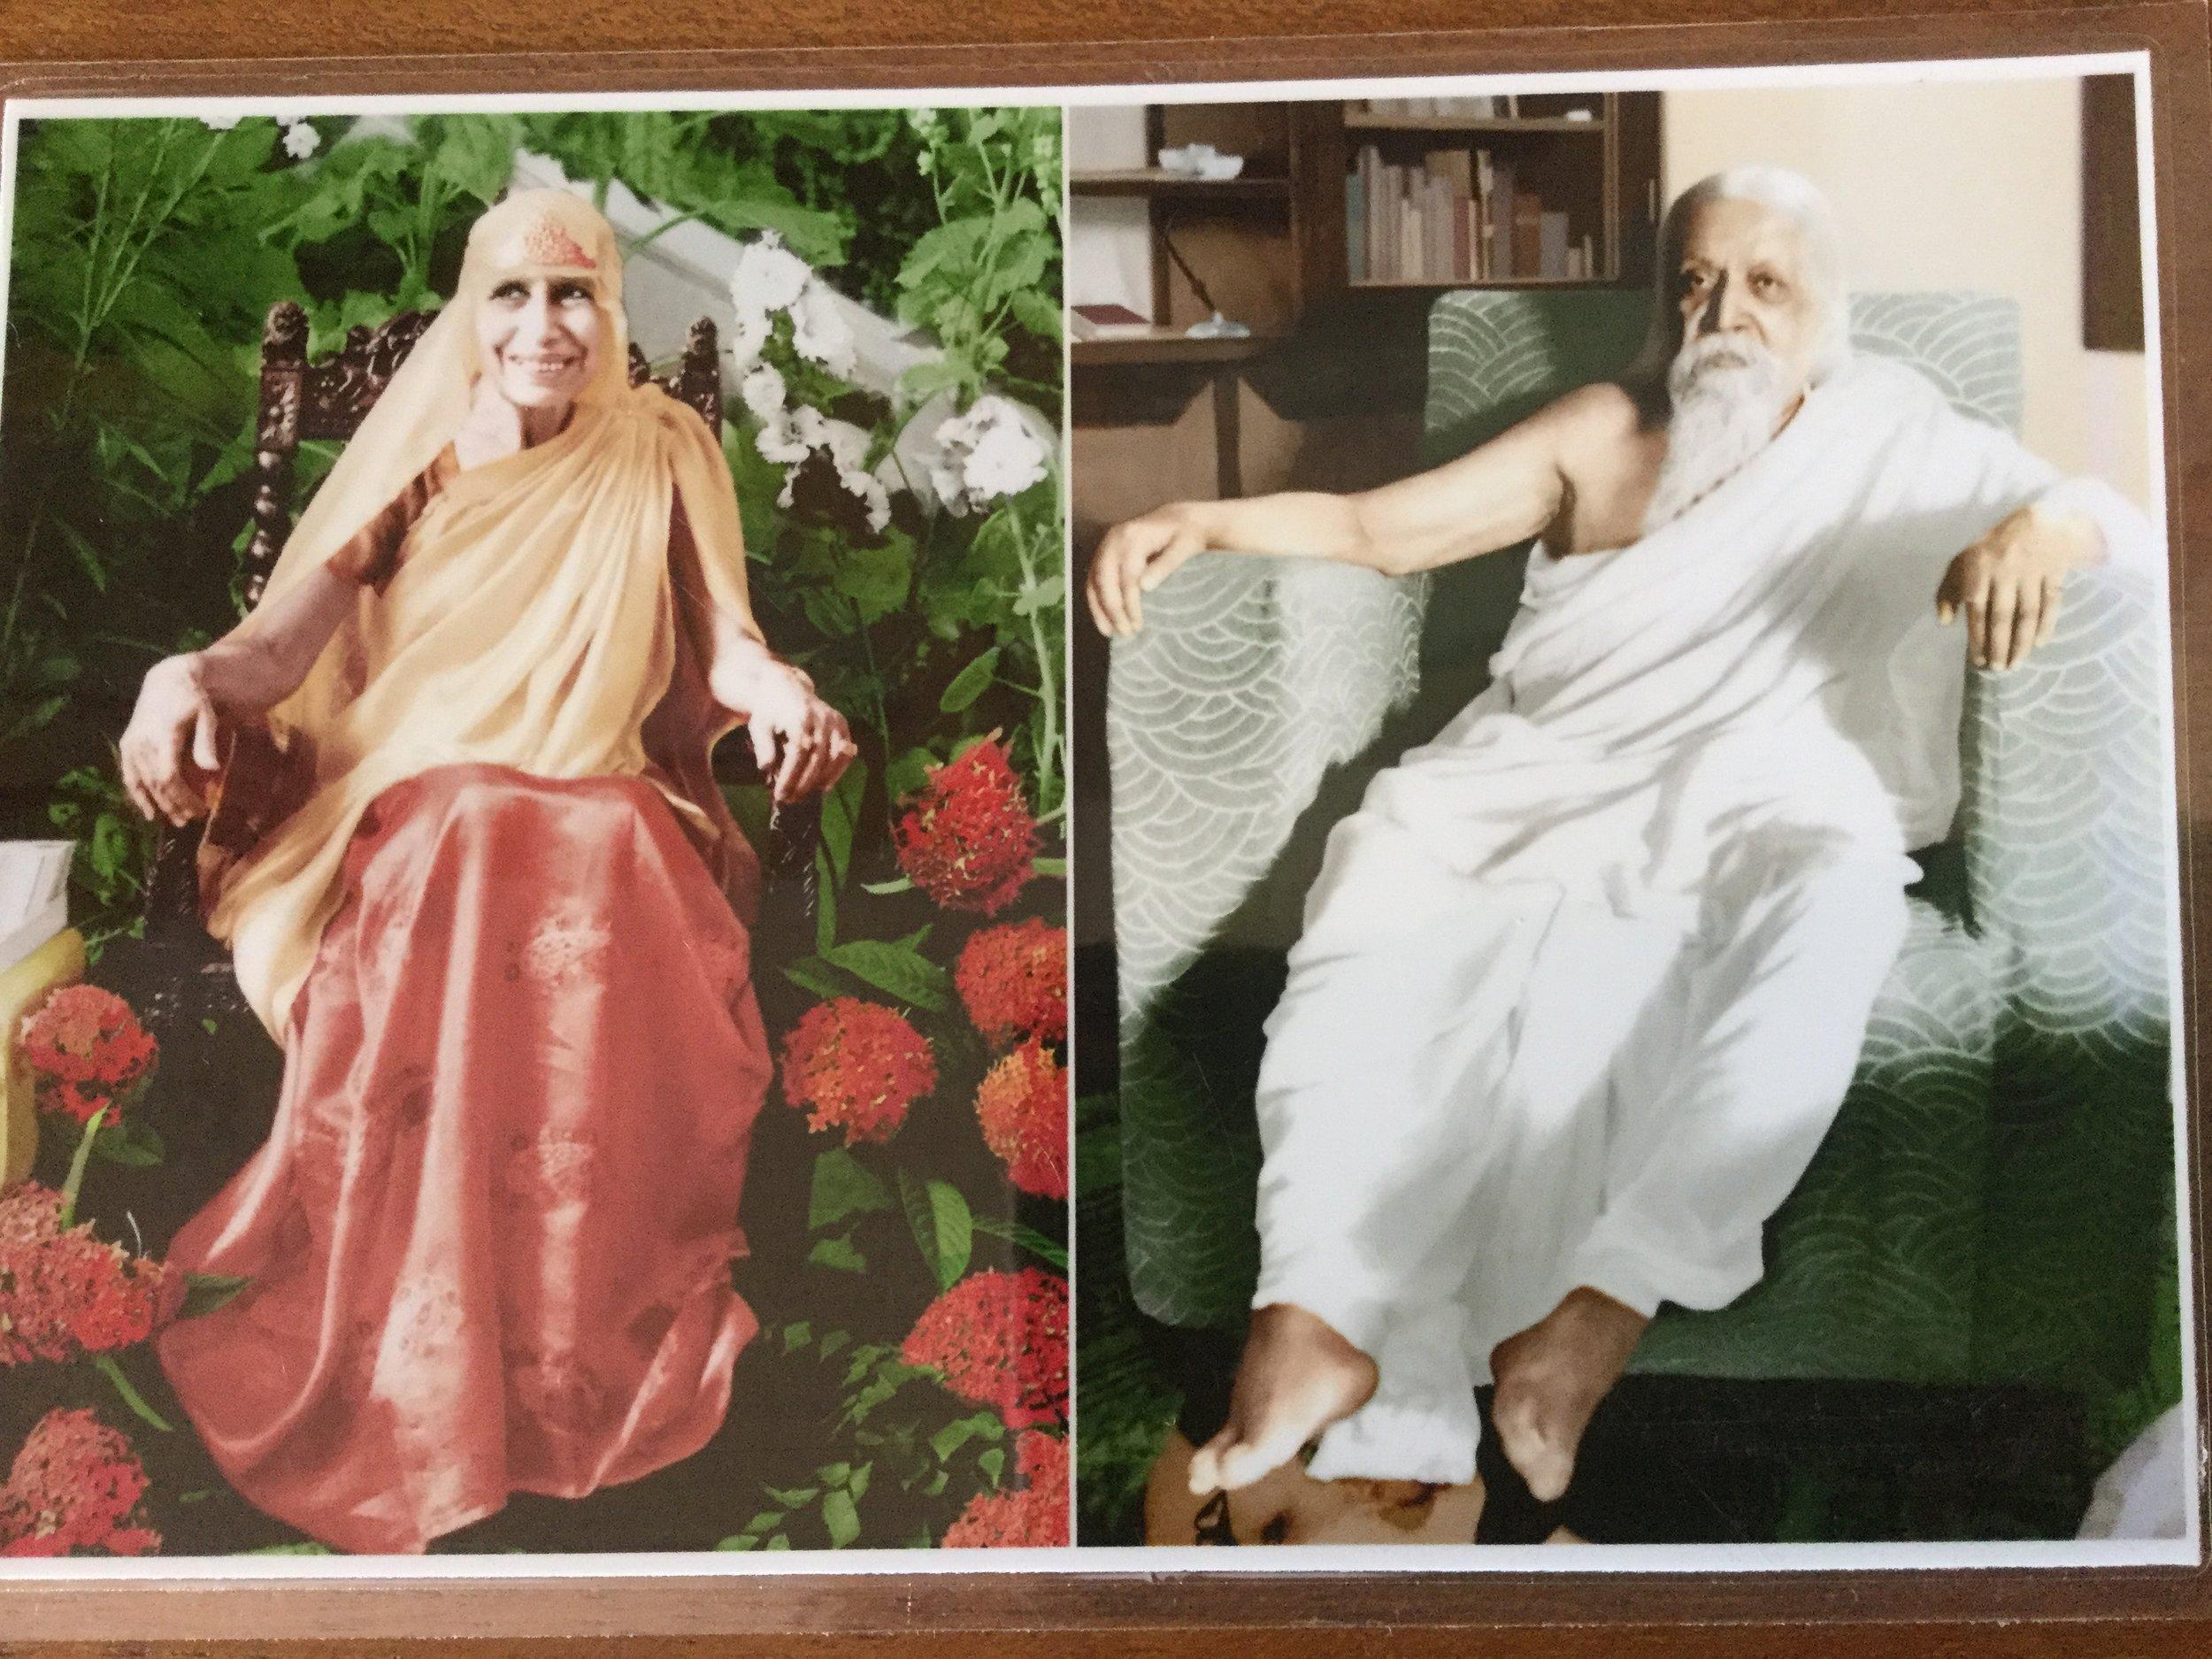 The Mother and Sri Aurobindo at the ashram.